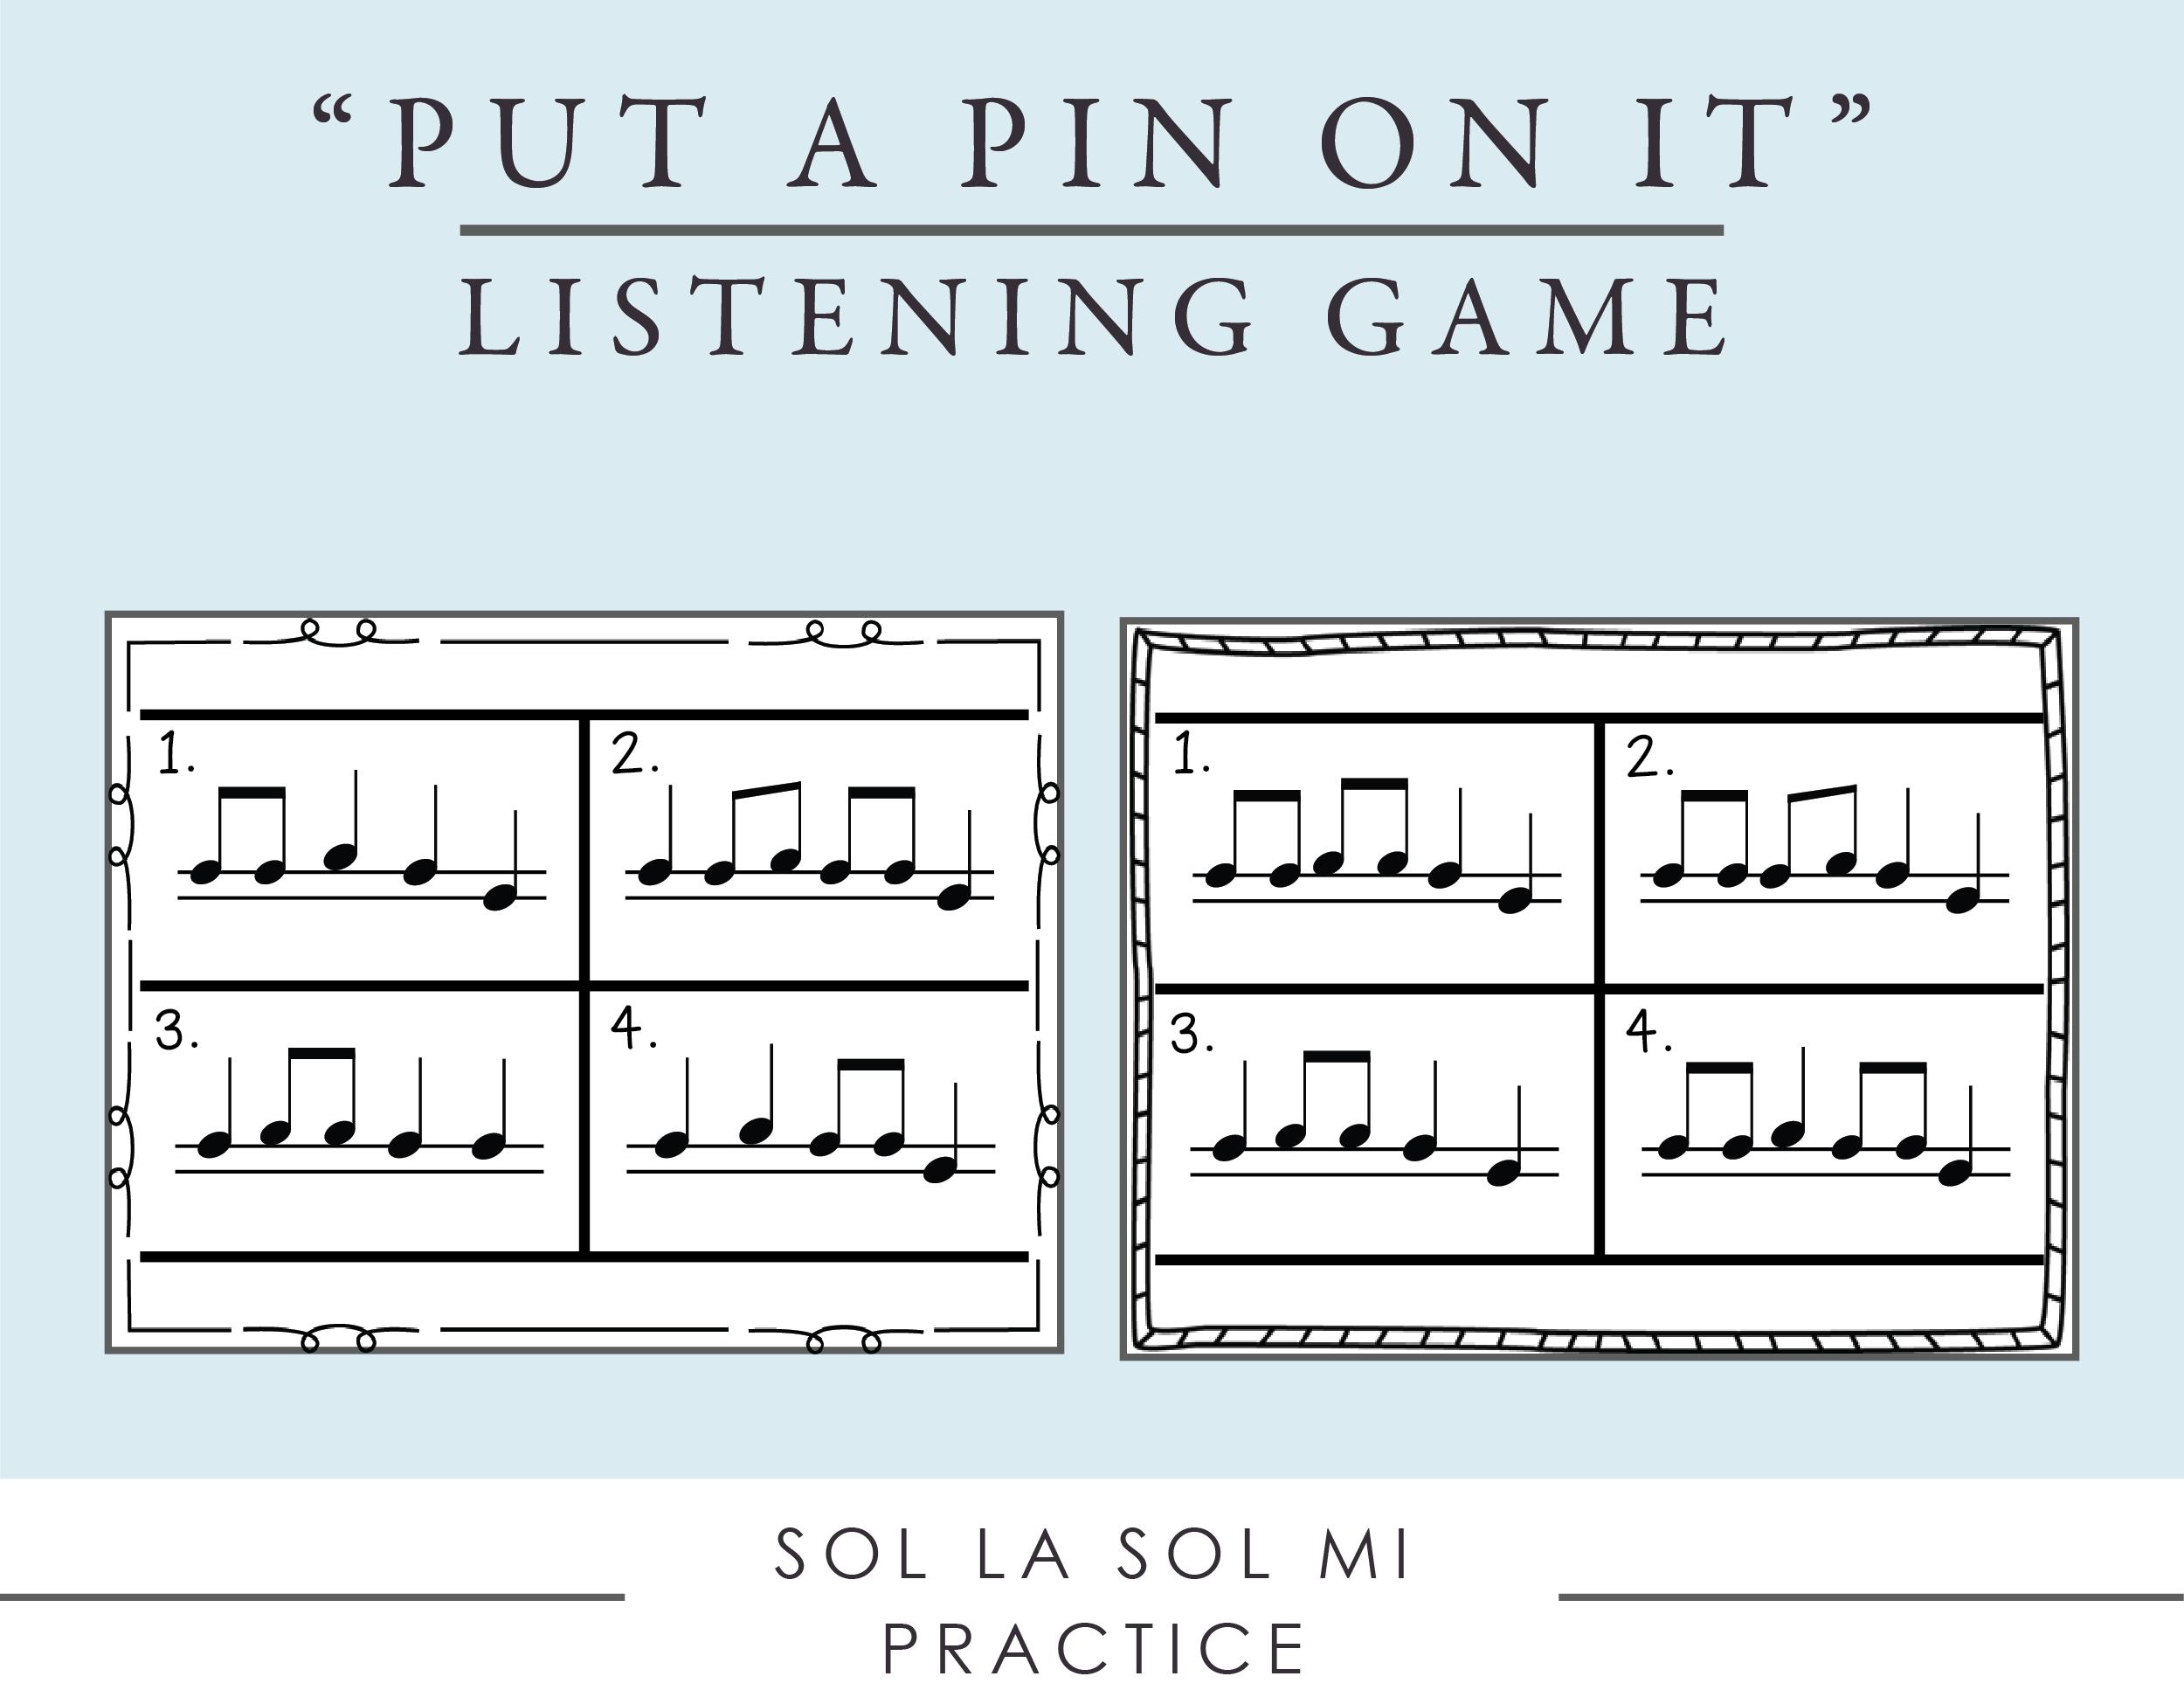 Put a Pin On It_Put a Pin on It.png